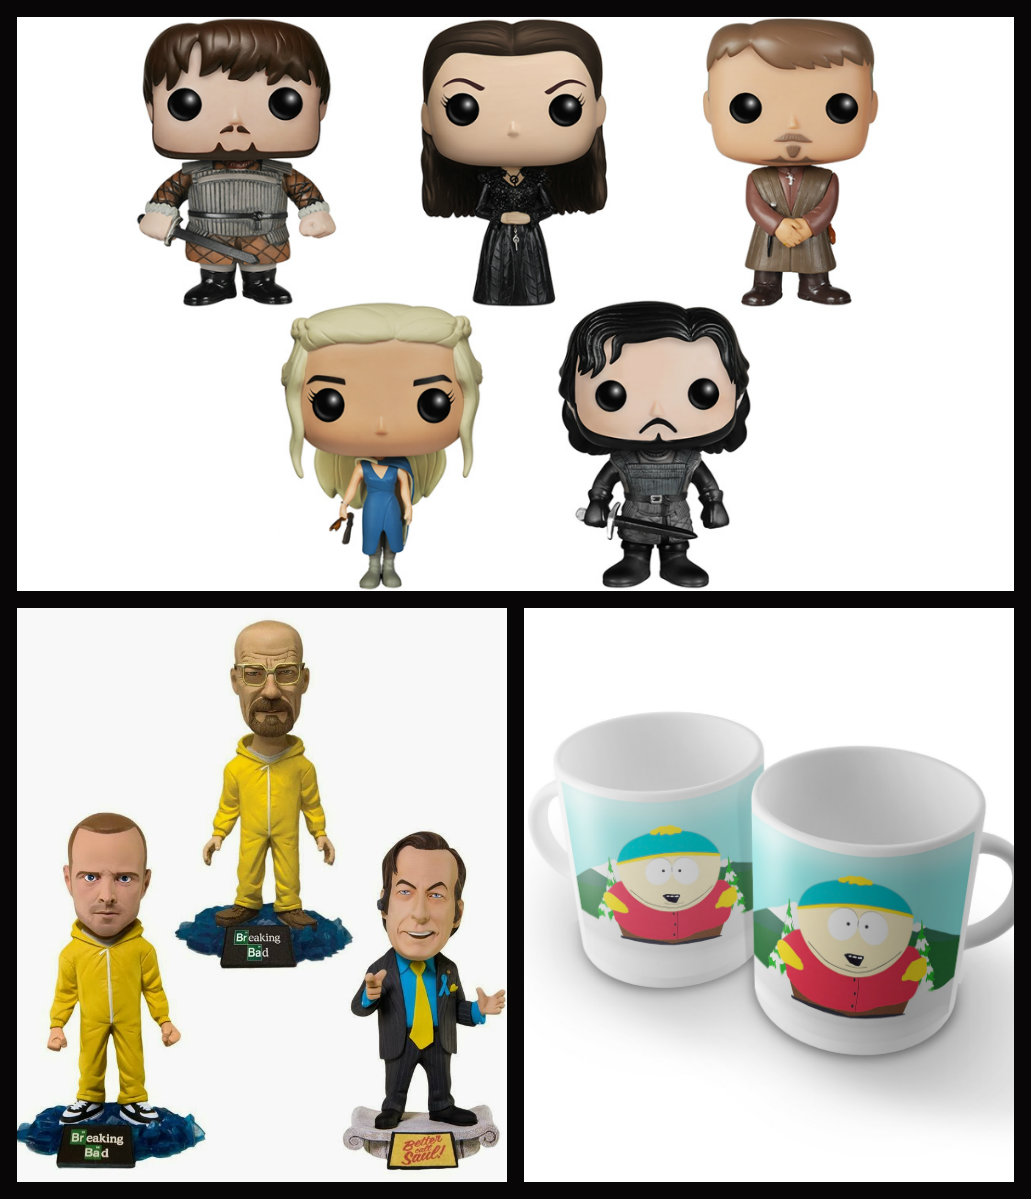 Sugestões de presentes geek - Bonecos funko colecionáveis G.O.T ~ Bonecos Colecionáveis Bobble head Breaking Bad ~ Canecas South Park.